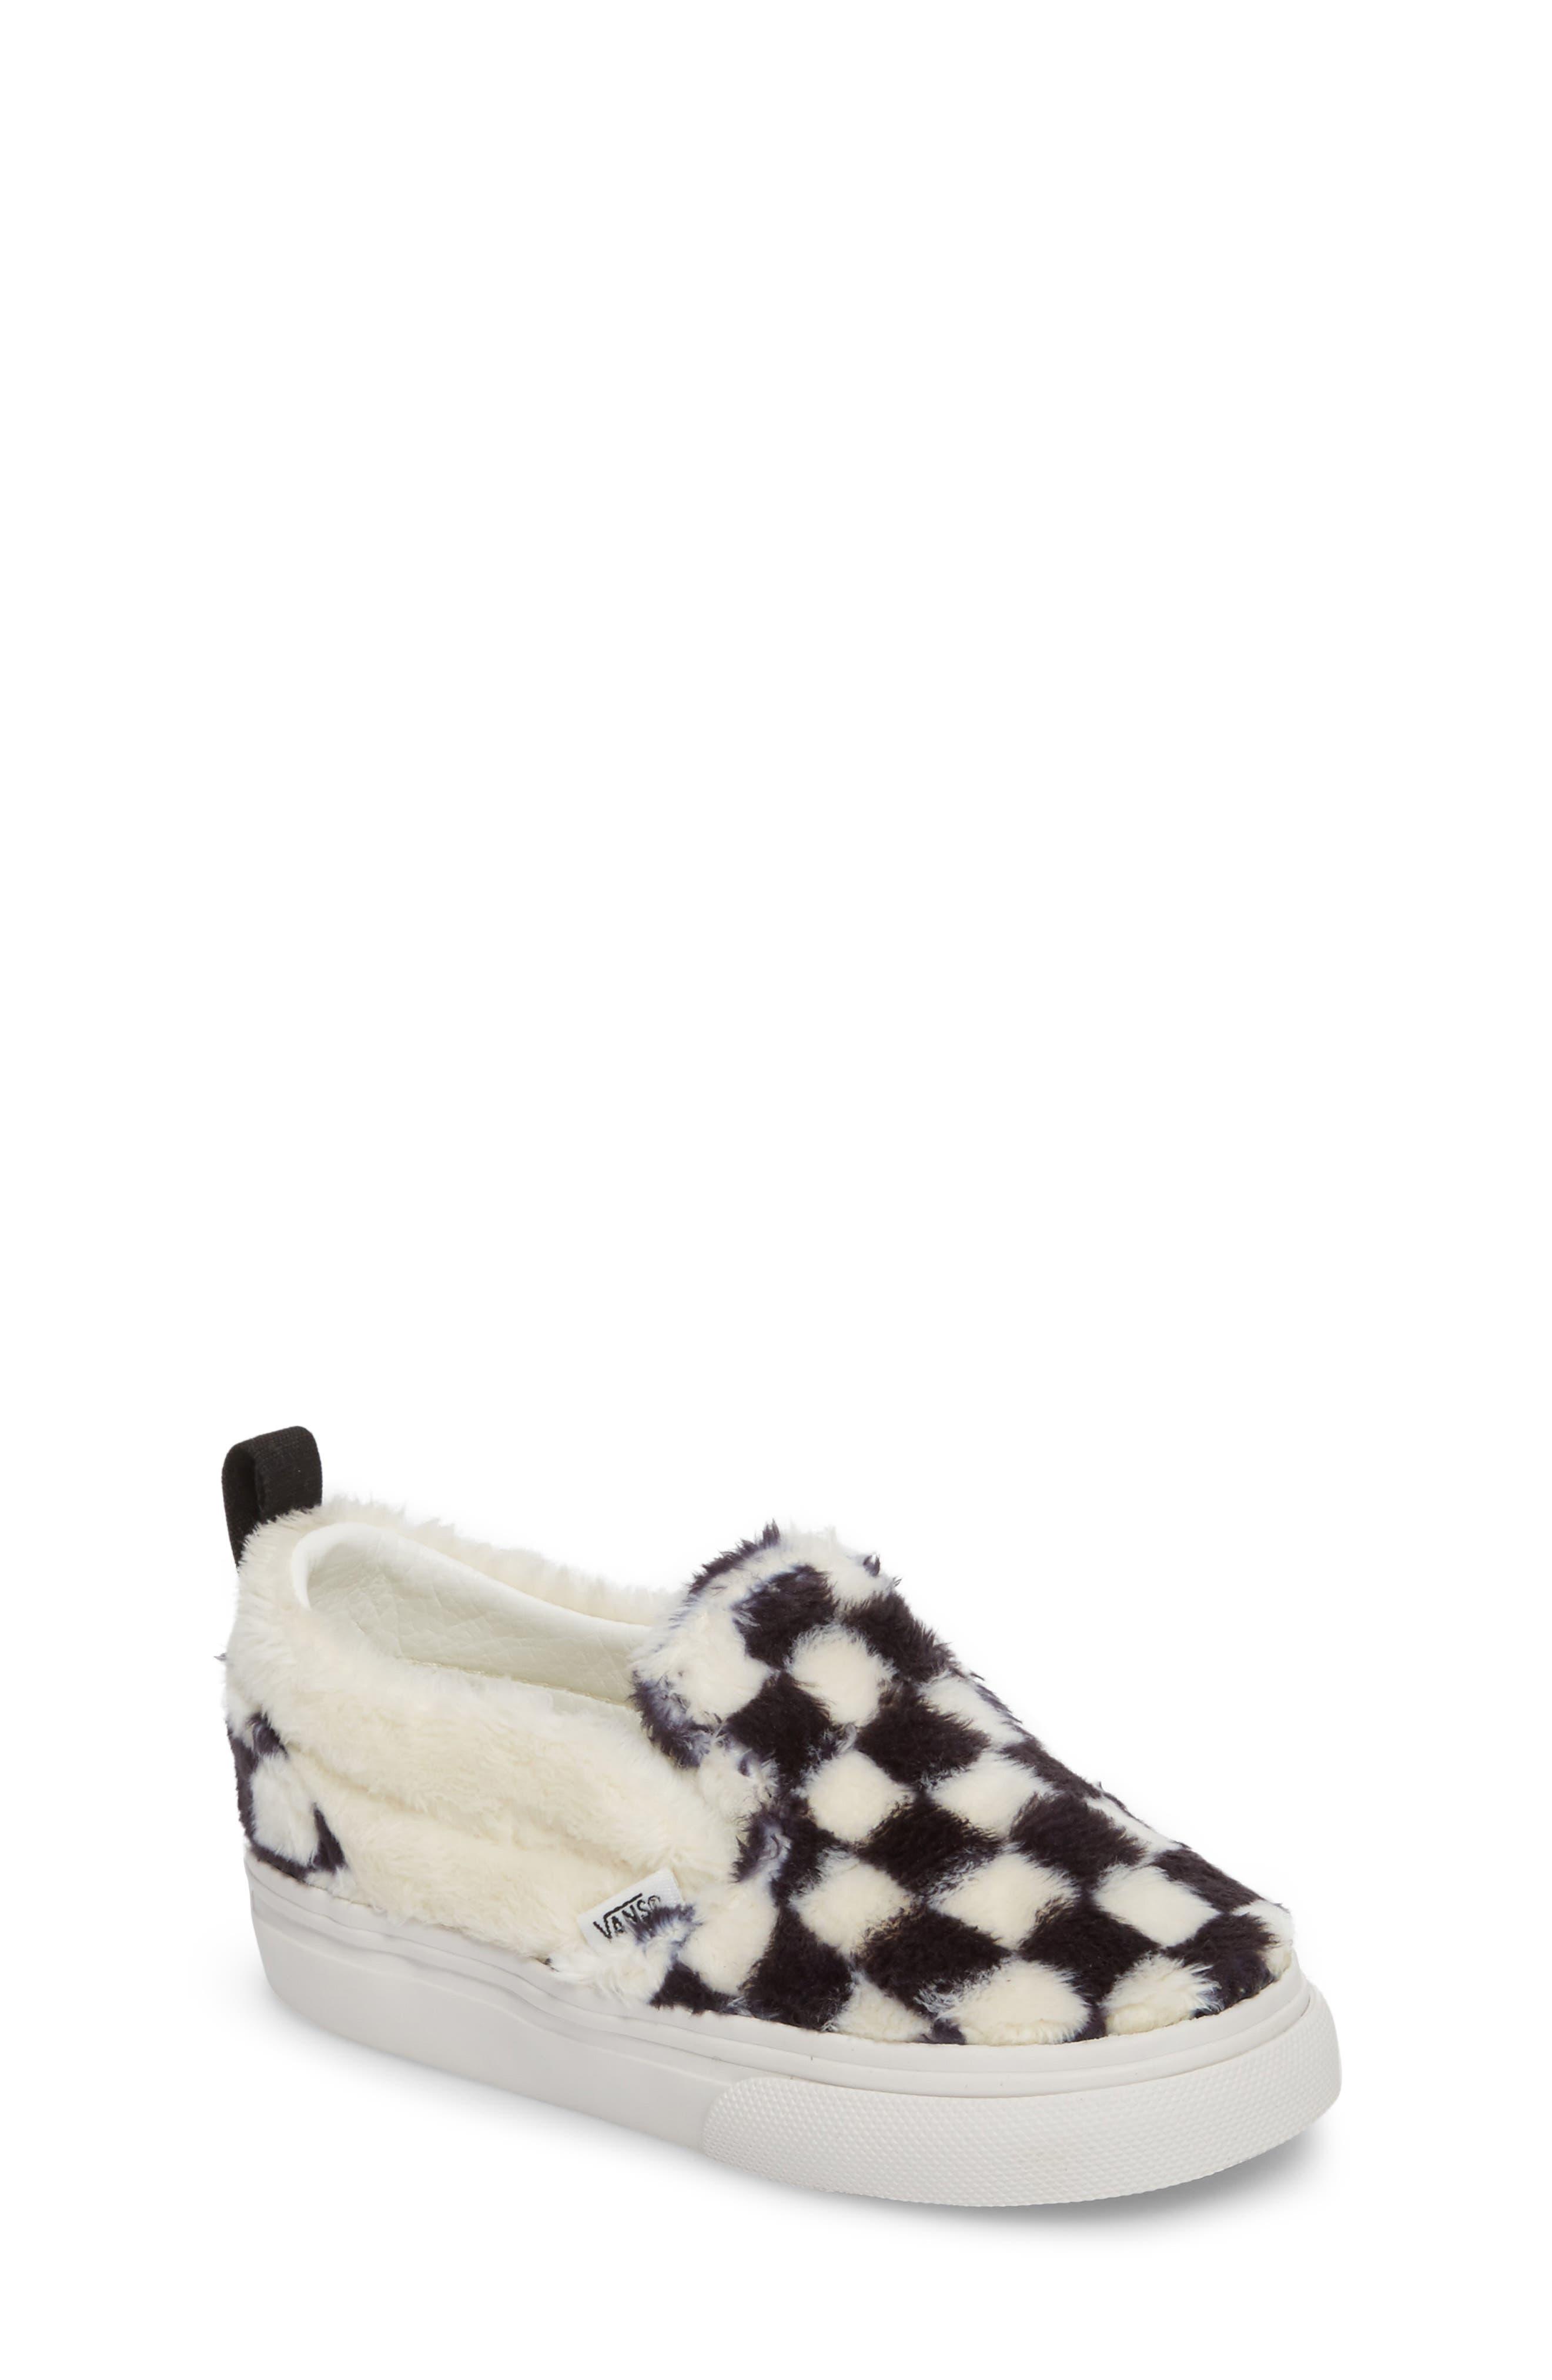 Faux Fur Slip-On Sneaker,                             Main thumbnail 1, color,                             Black/ White Sherpa Check